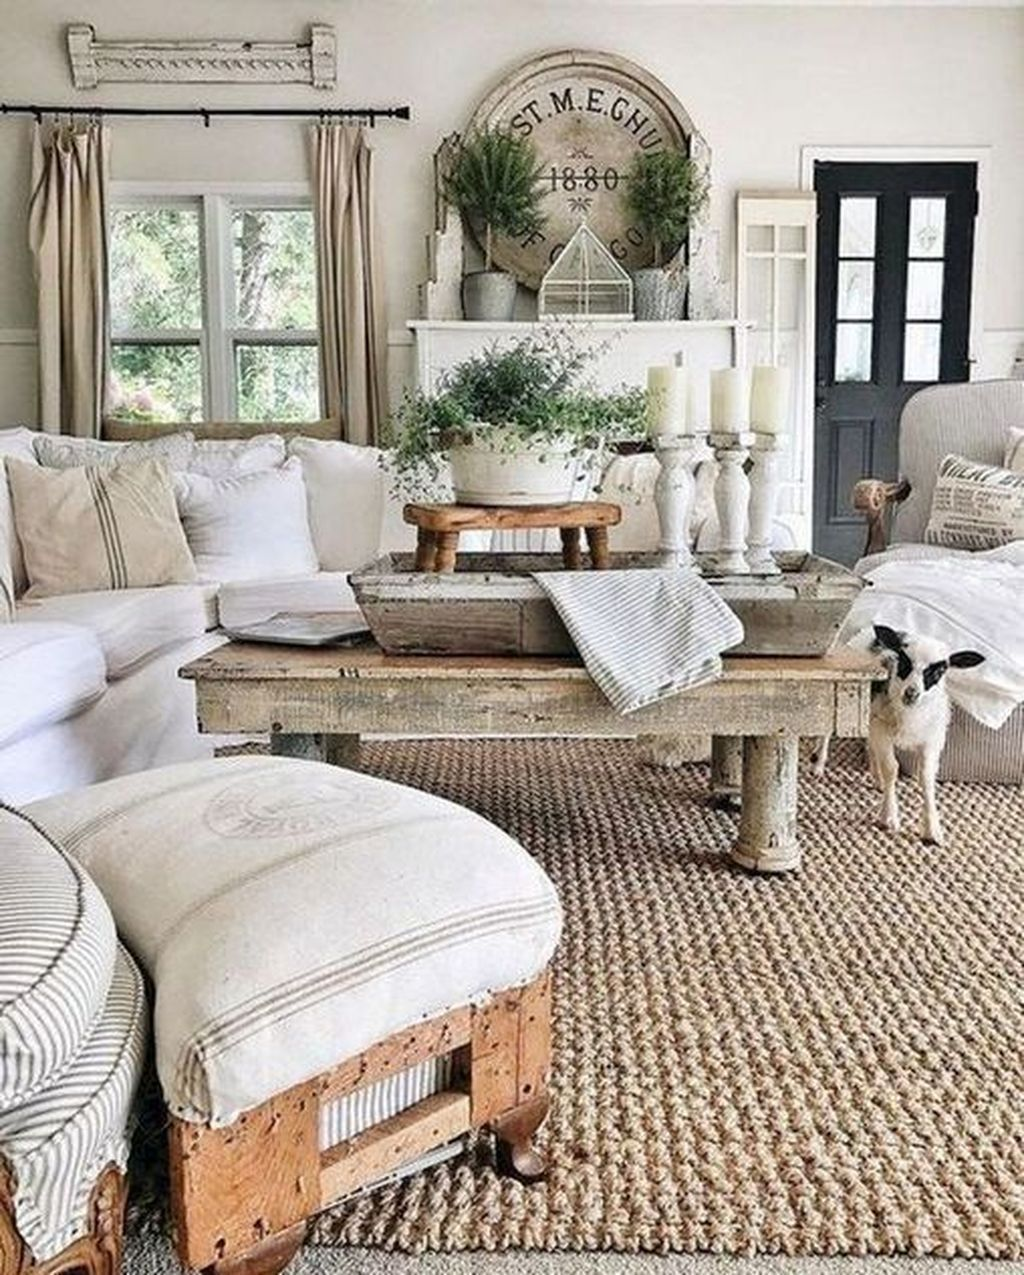 Cool comfy farmhouse living room decor ideas also rh pinterest